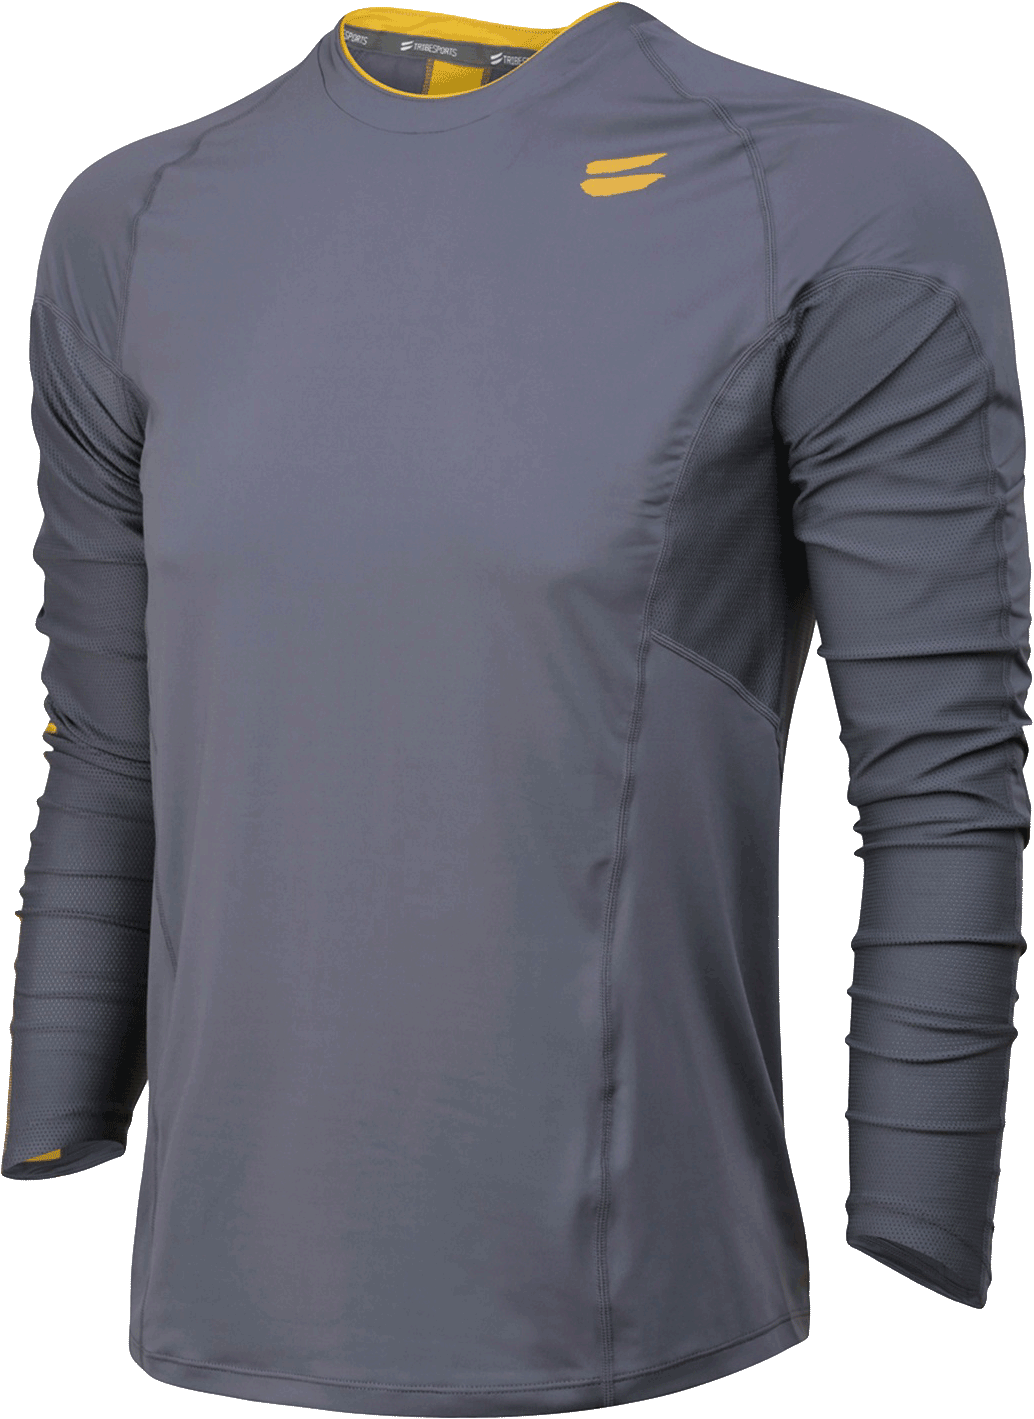 Buy tribesports men 39 s performance t shirt long sleeve for Buy mens long sleeve t shirts